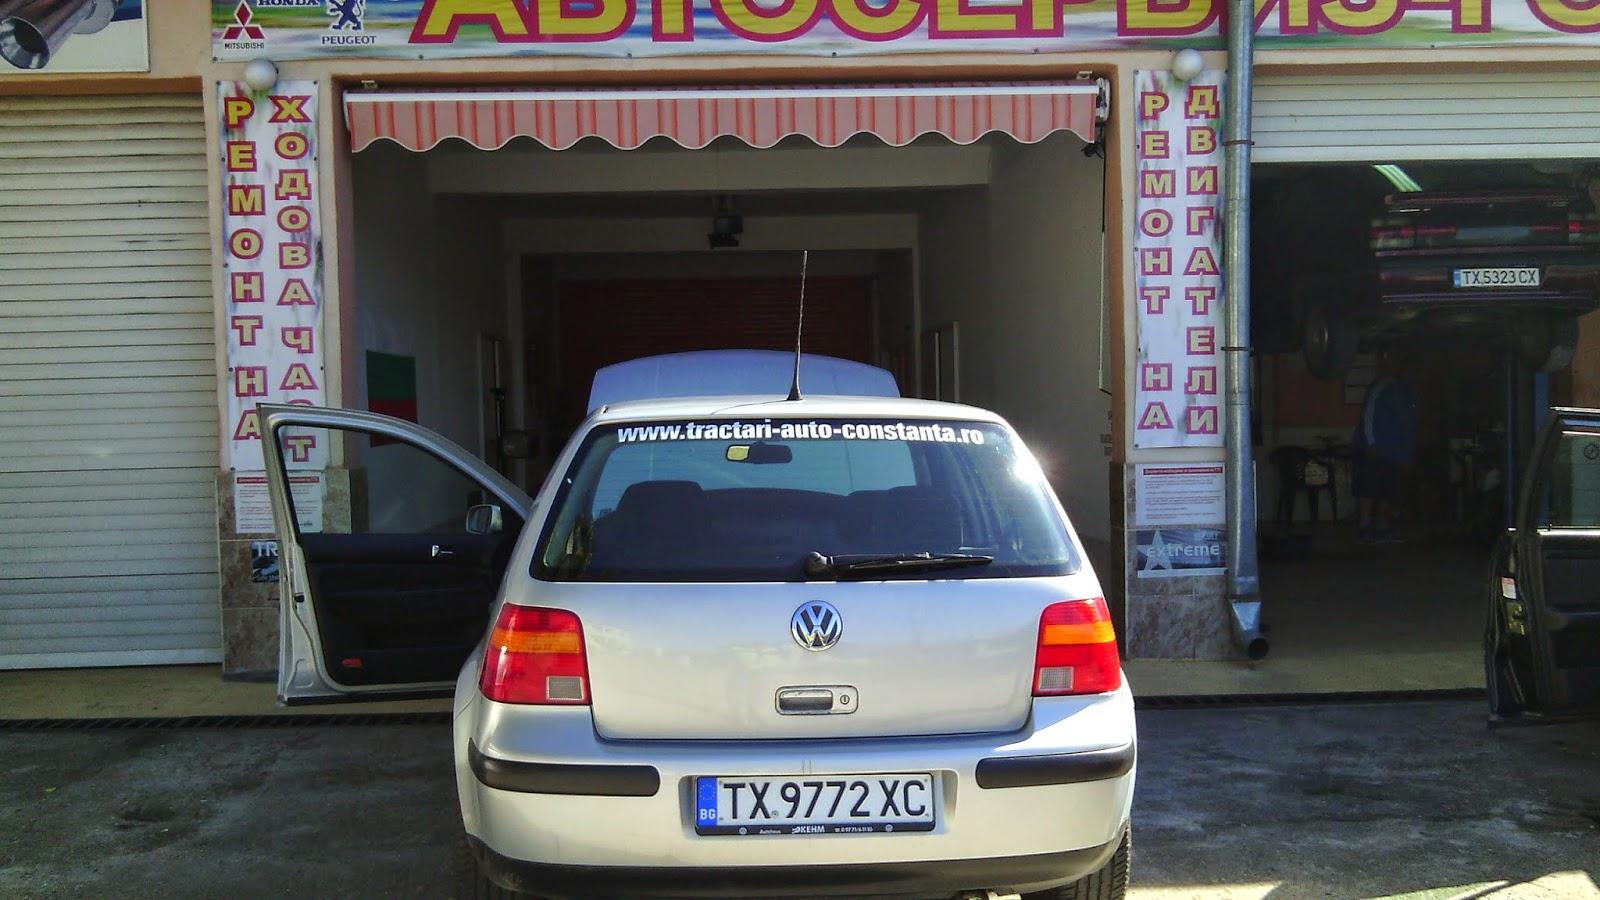 http://tractari-auto-constanta.ro/inmatriculari.html